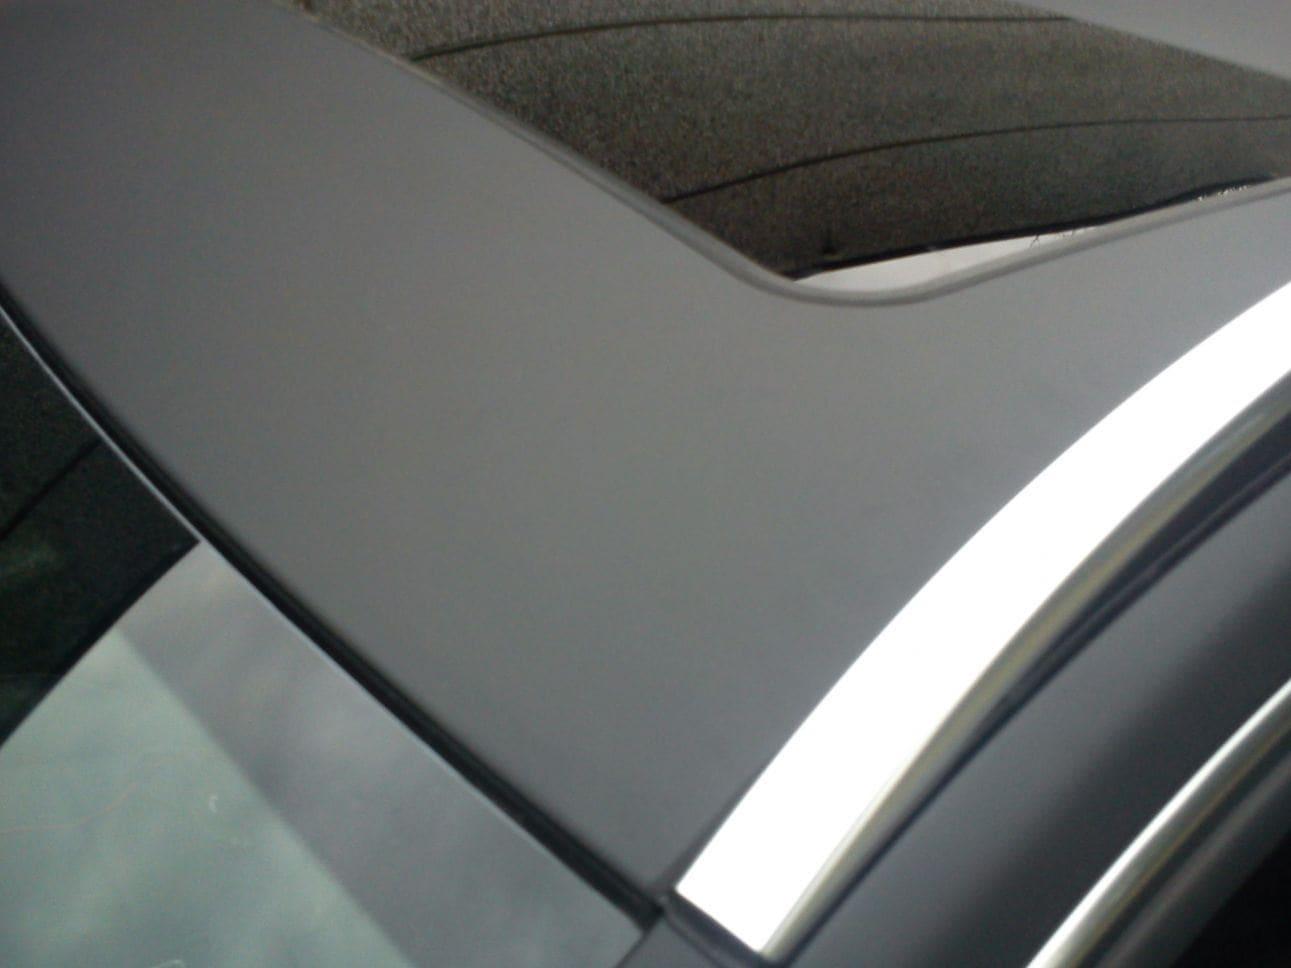 Mercedes E320 met Mat Zwarte Wrap, Carwrapping door Wrapmyride.nu Foto-nr:6235, ©2021